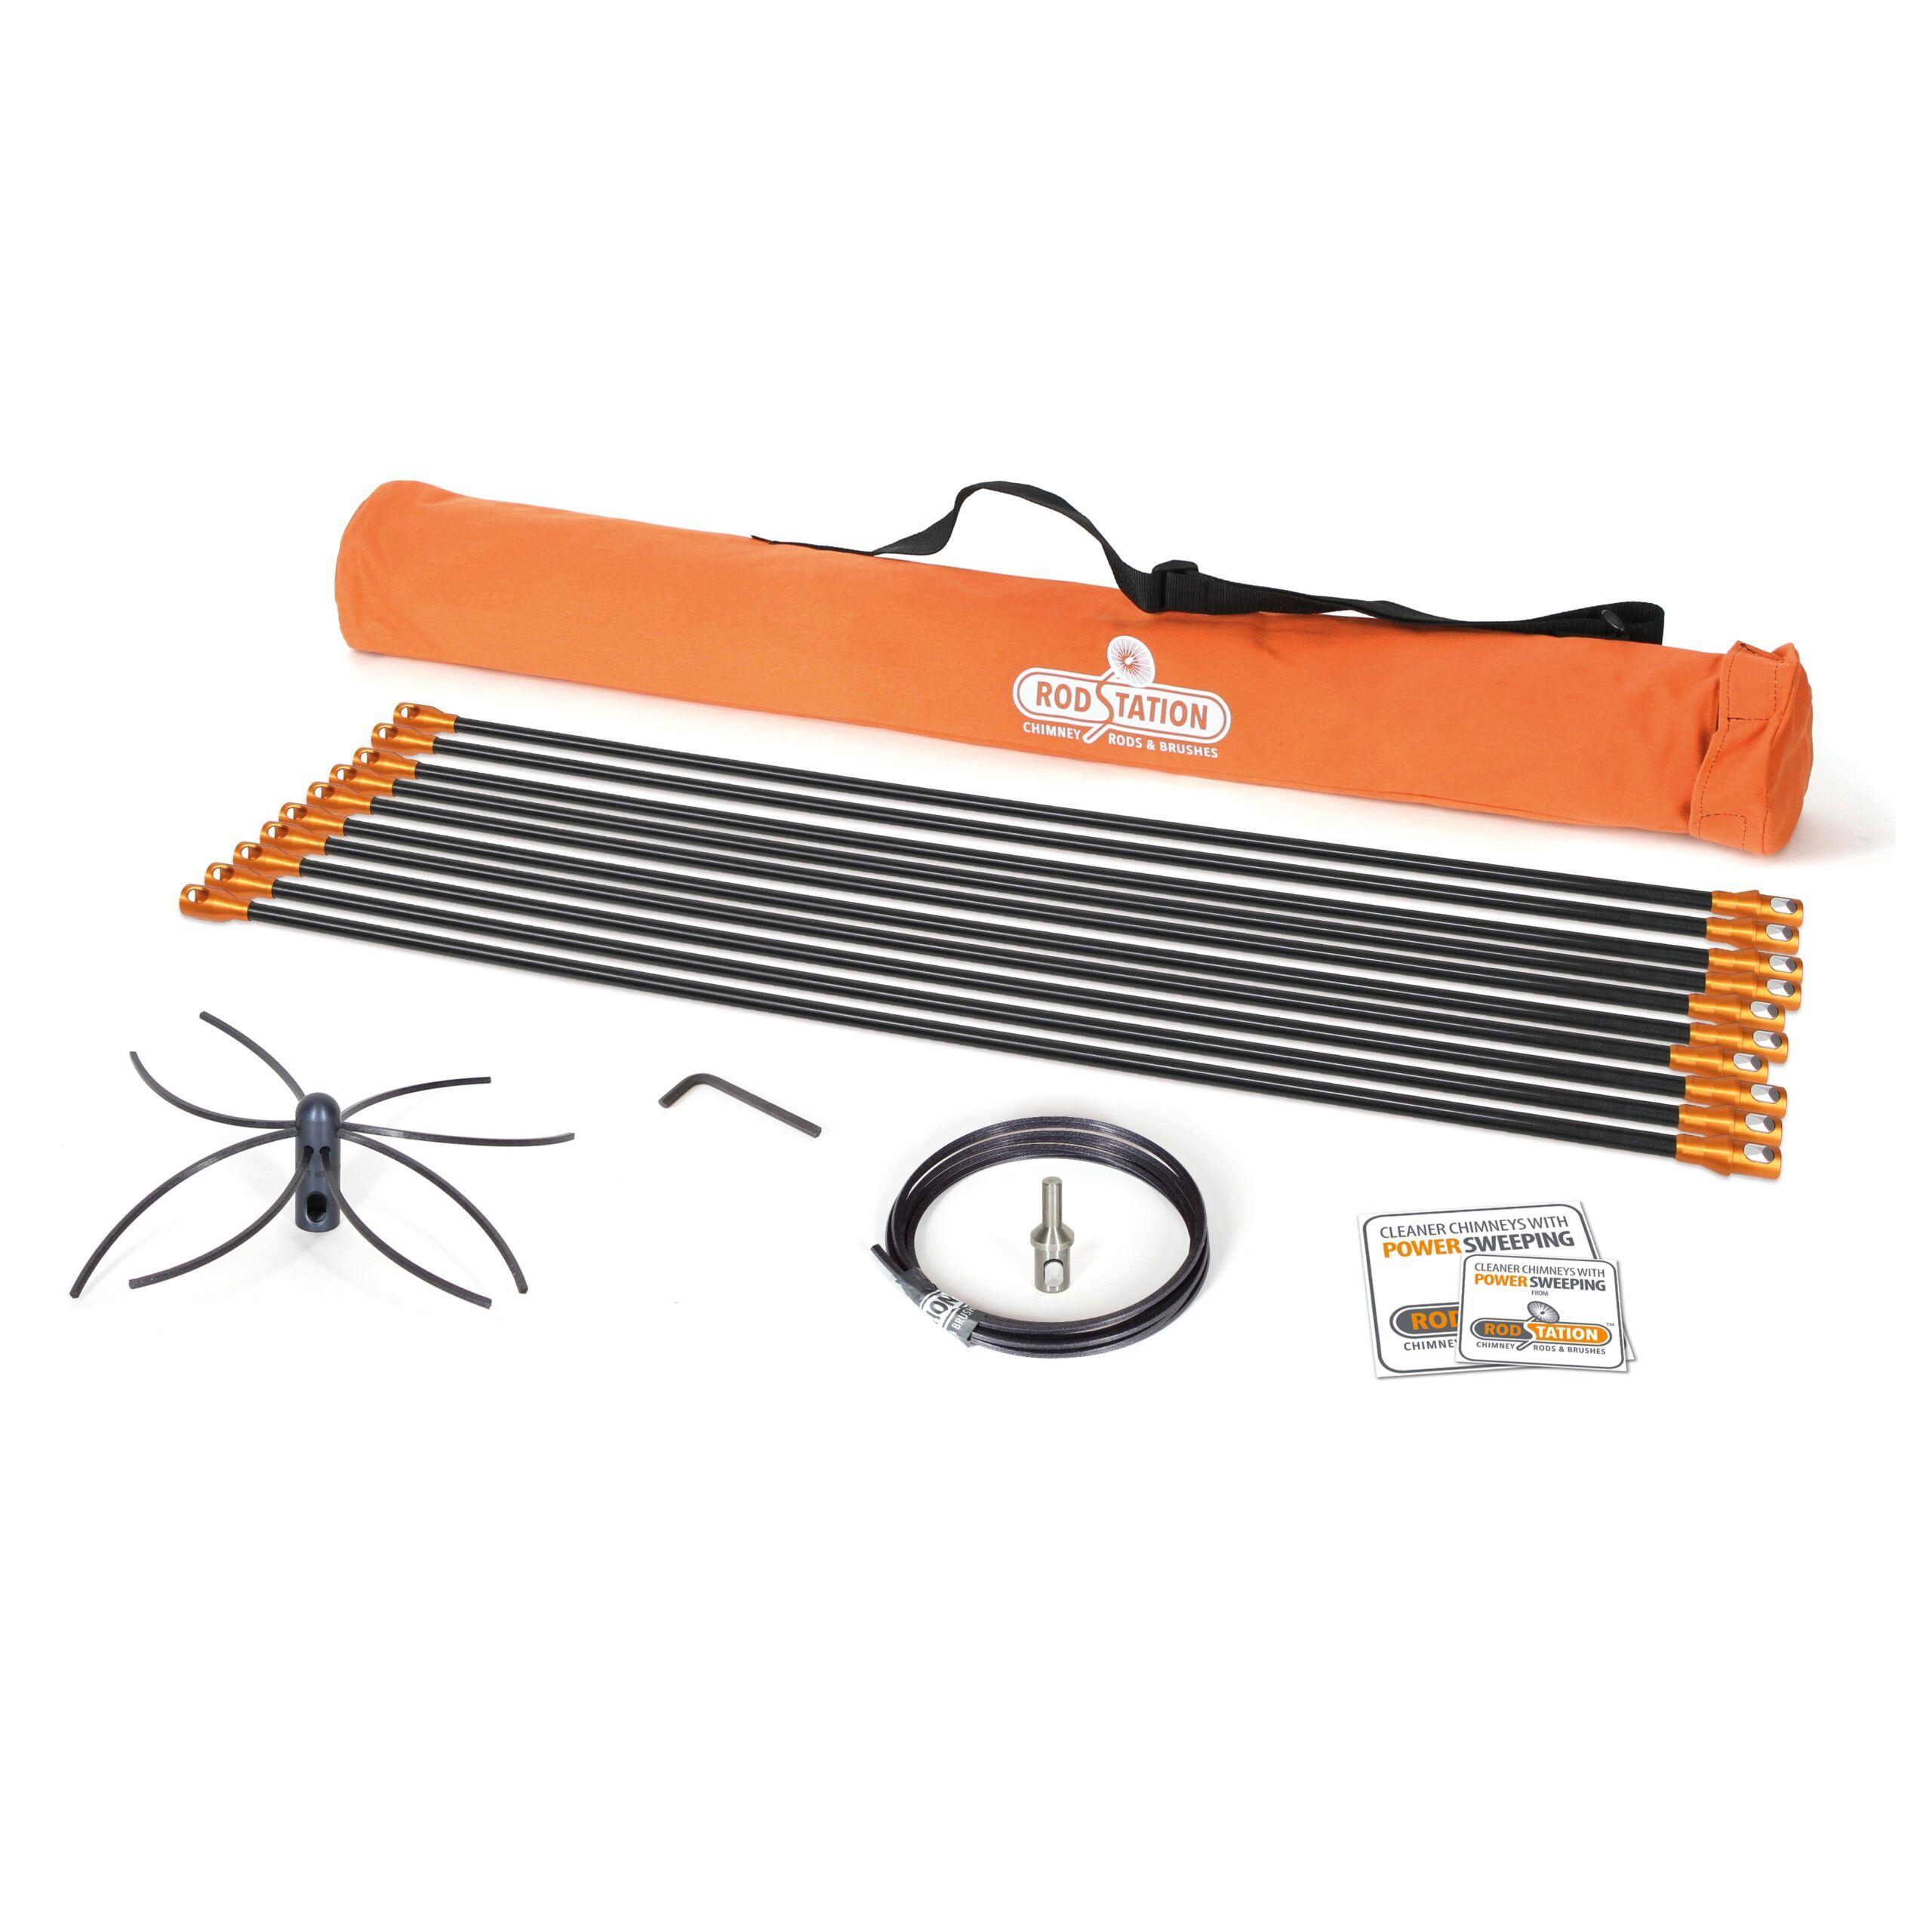 Flexible liner power sweeping kit